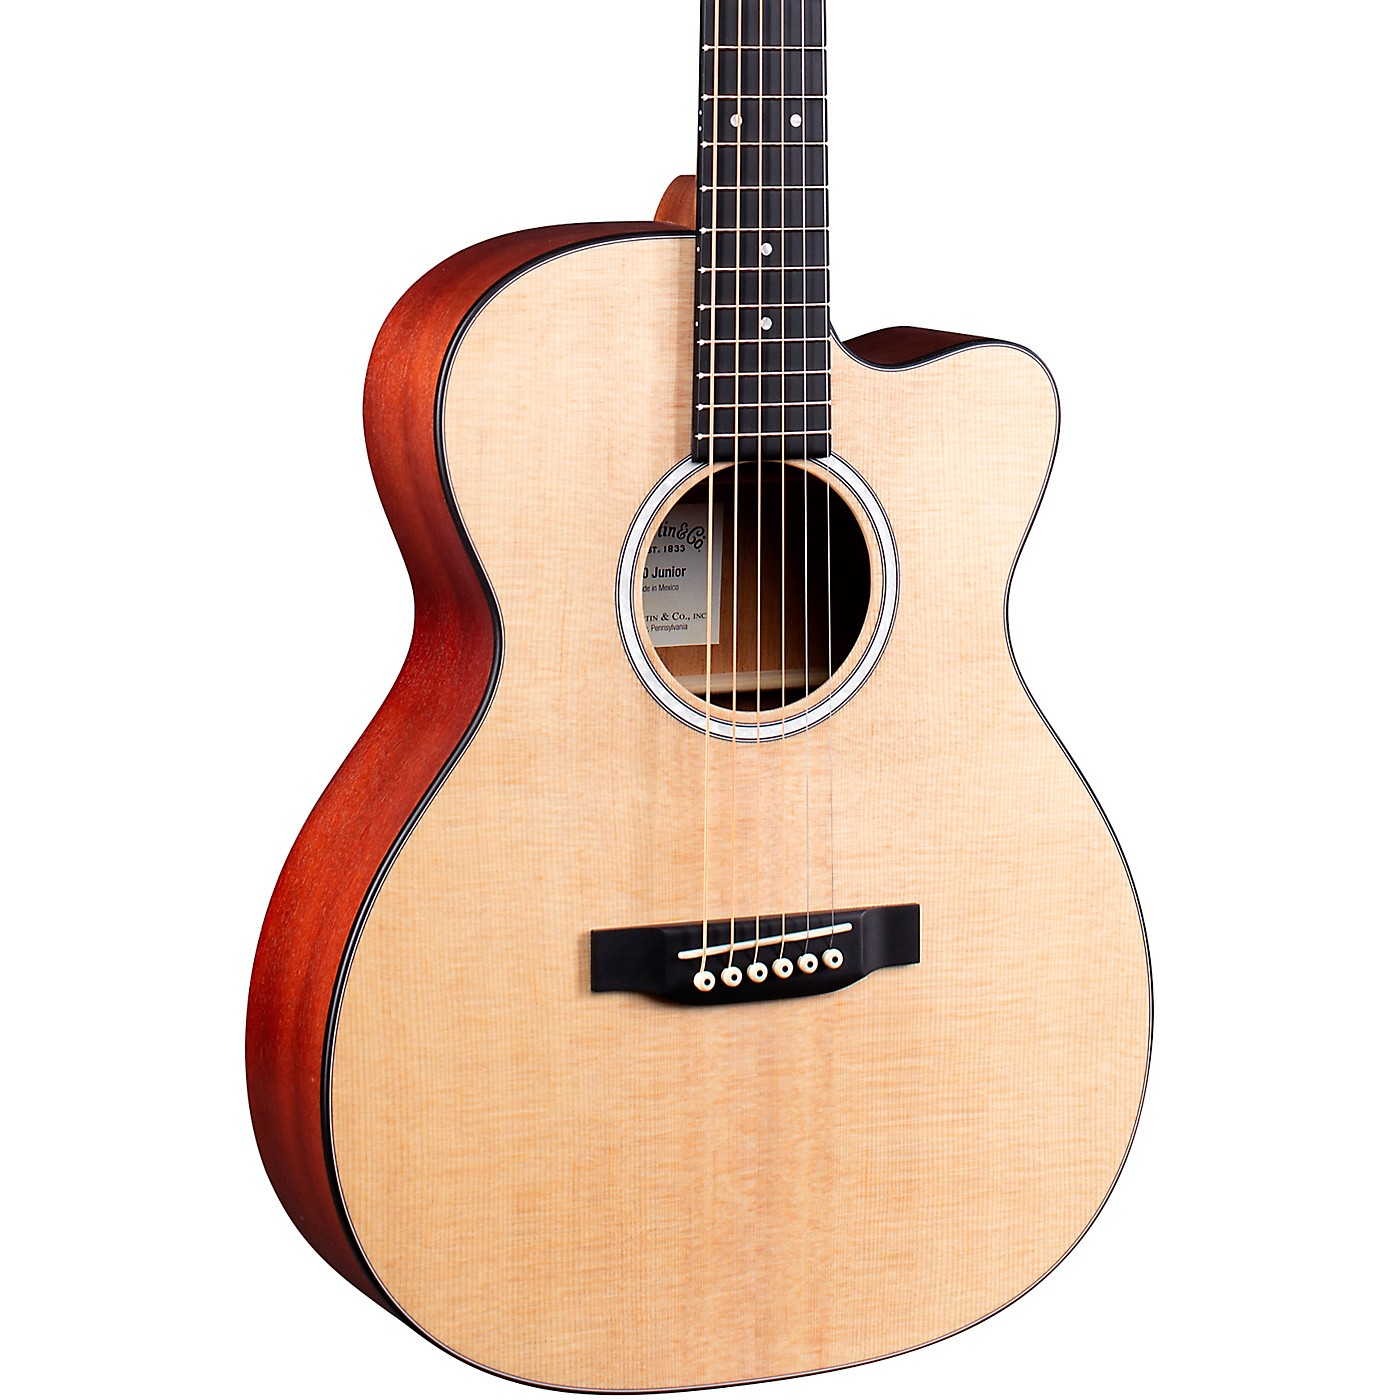 Martin 000 Jr-10E Auditorium Cutaway Acoustic-Electric Guitar thumbnail